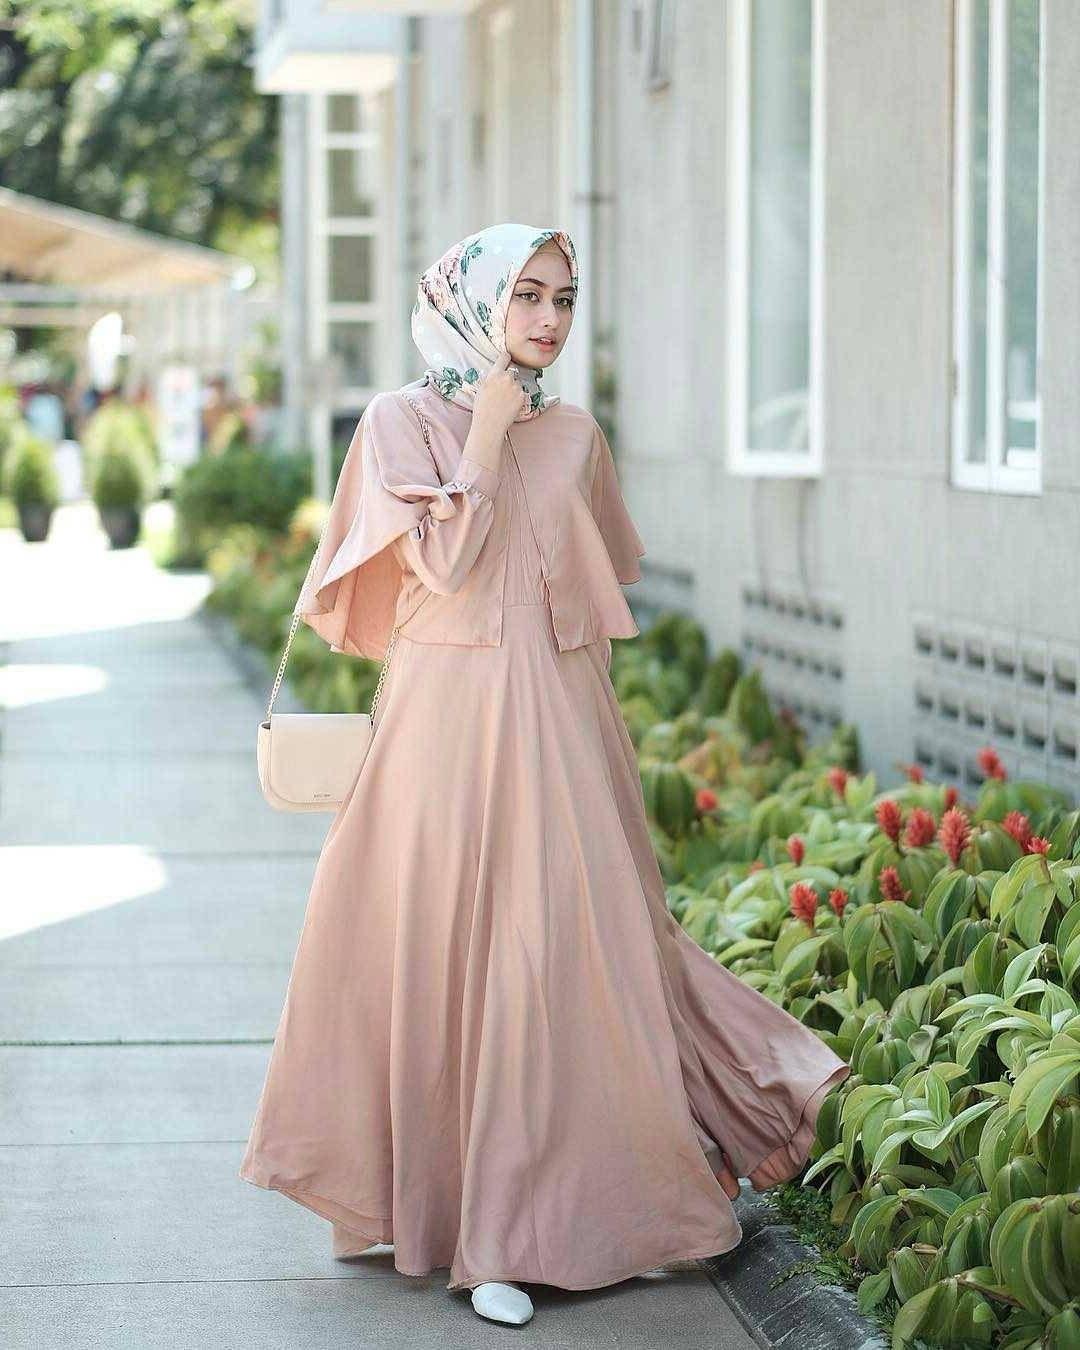 Model Baju Baju Lebaran Jxdu Model Baju Gamis Terbaru Lebaran Gambar islami